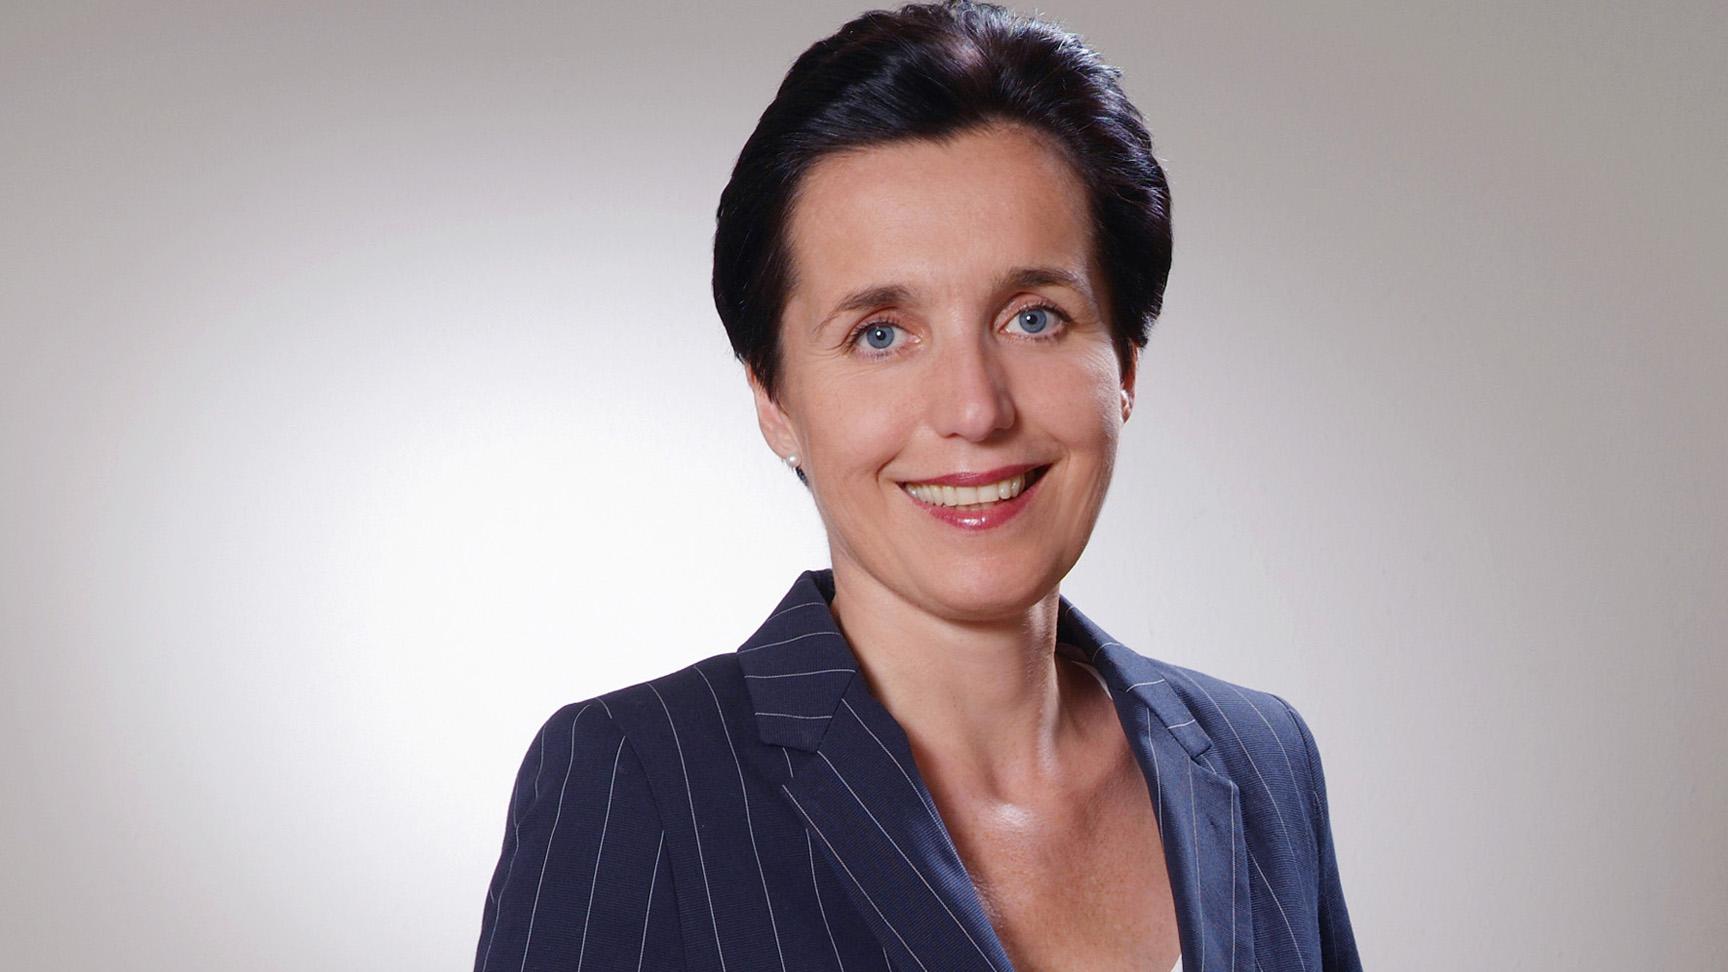 Prof. Dr. Gabriele Zimmermann